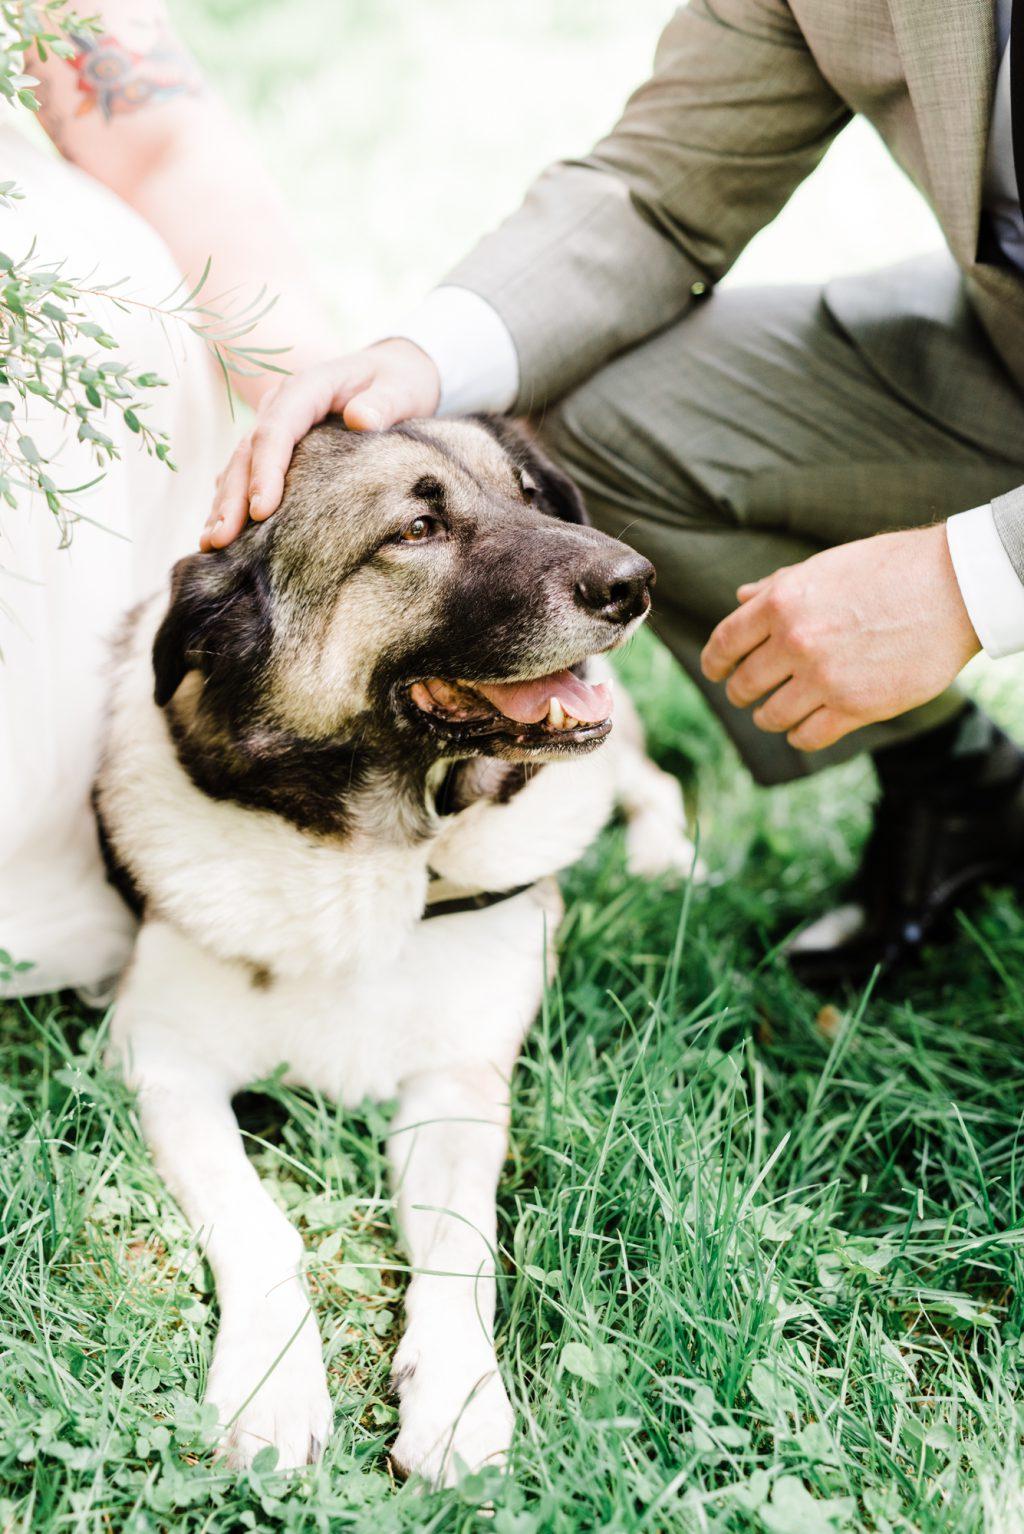 haley-richter-photo-west-chester-summer-wedding-boxcar-brewery-037